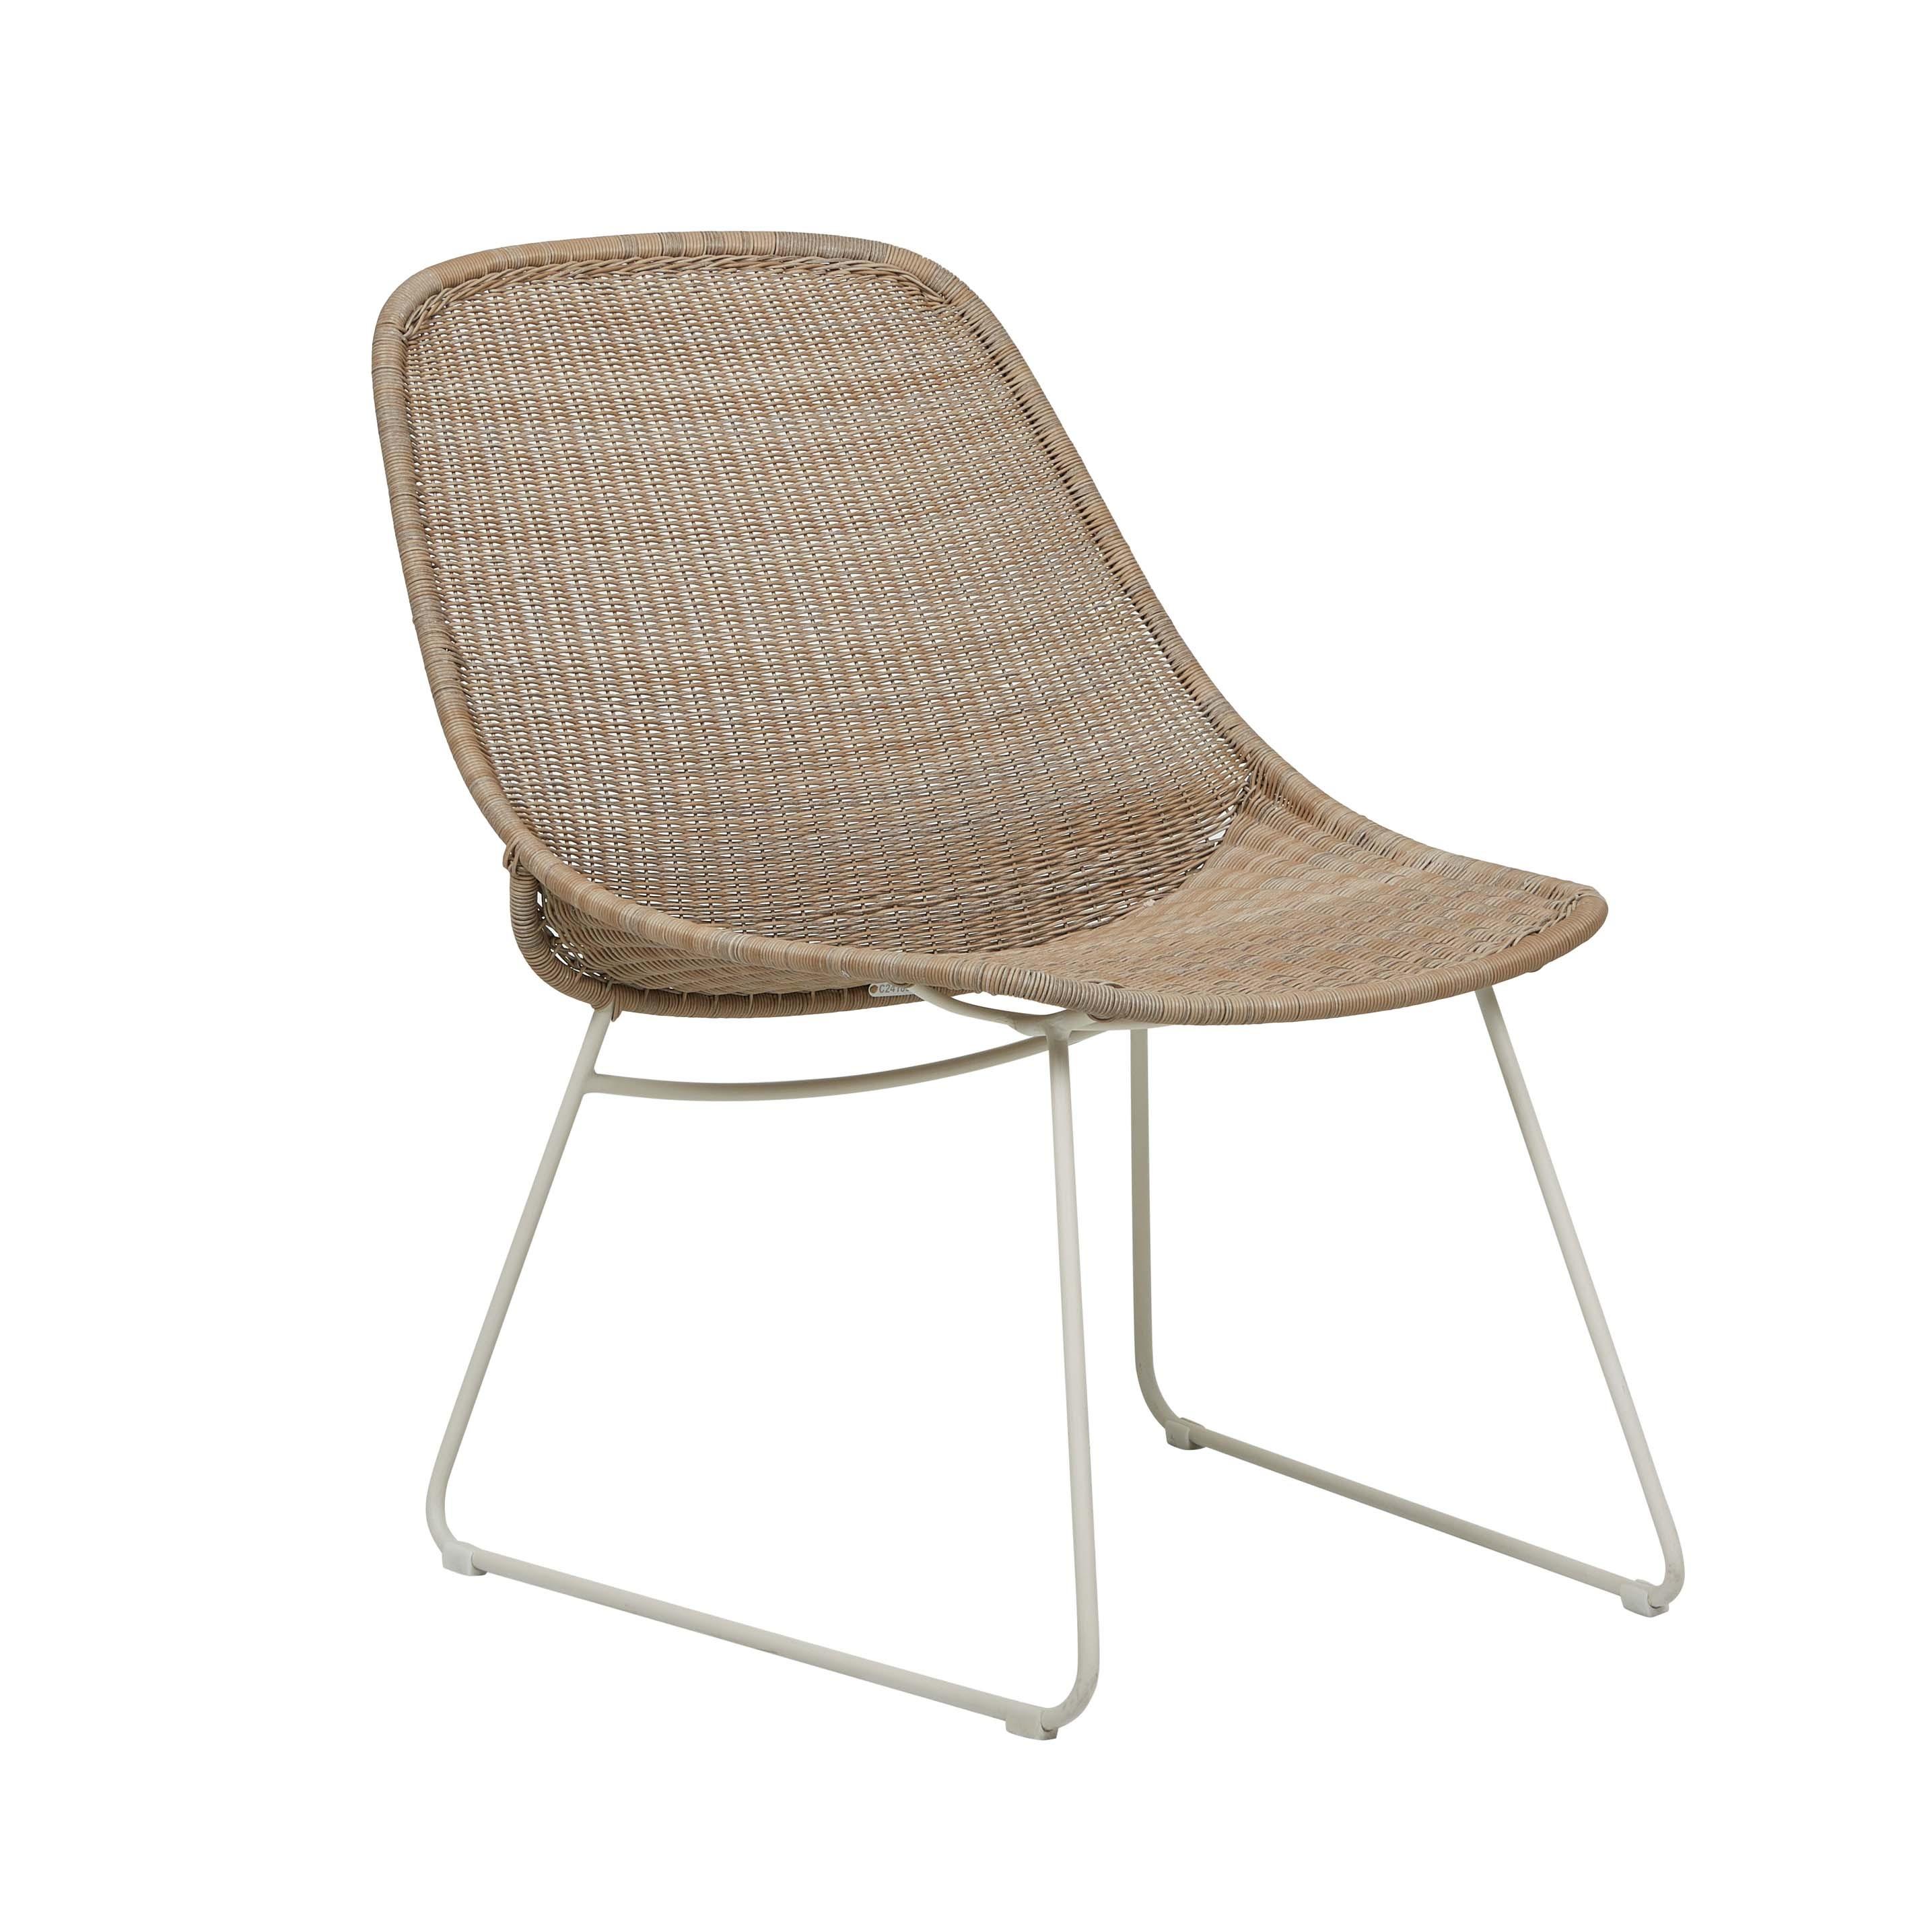 Furniture Hero-Images Occasional-Chairs granada-scoop-closed-weave-02